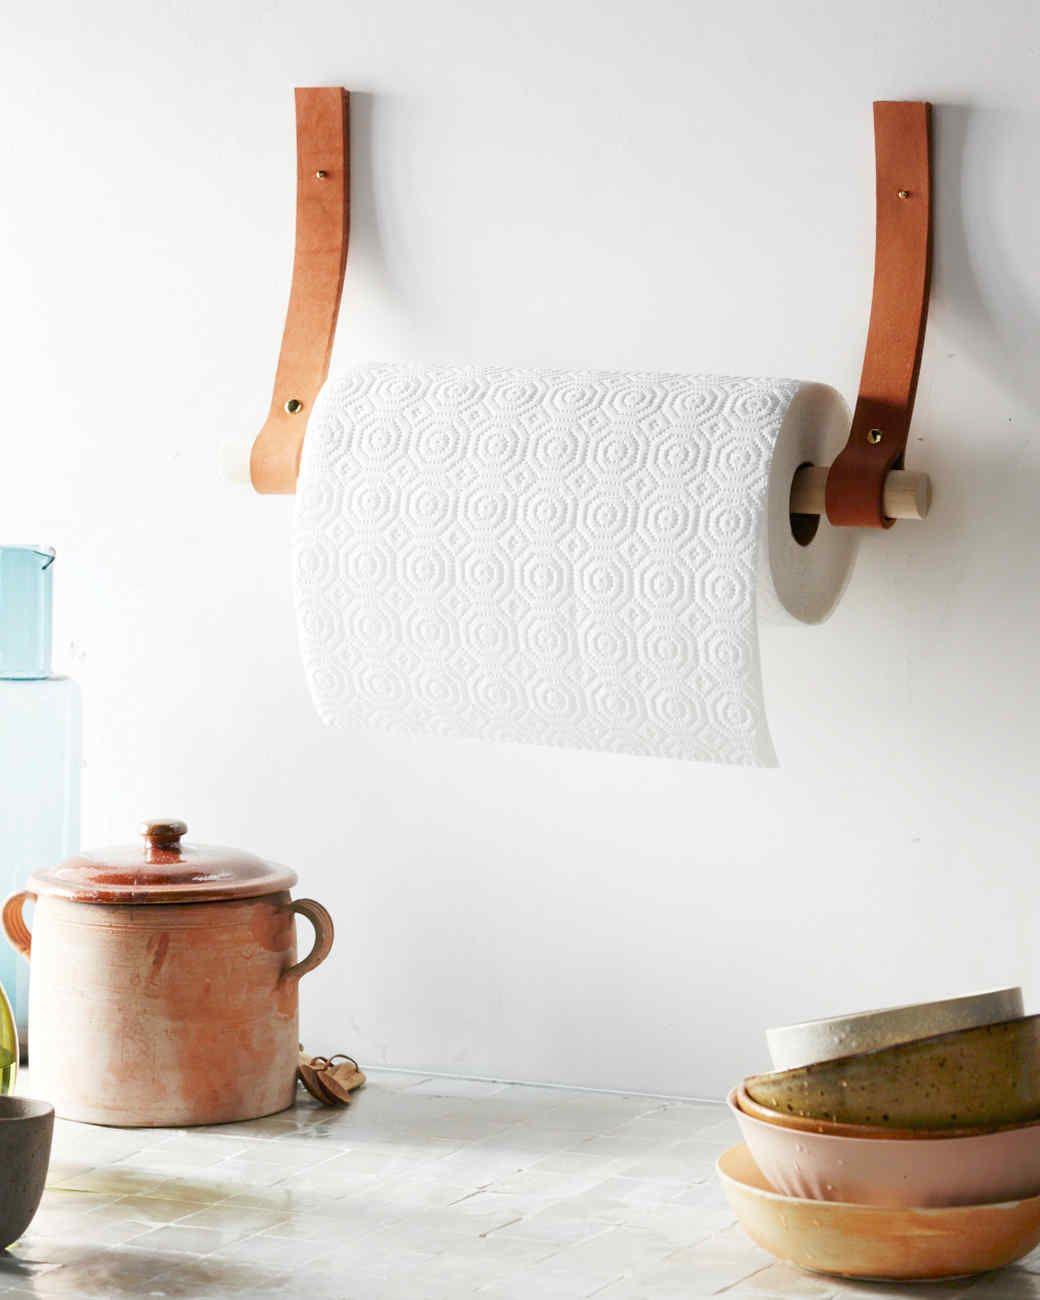 leather paper towel holder - Diy Toilettenpapierhalter Stand